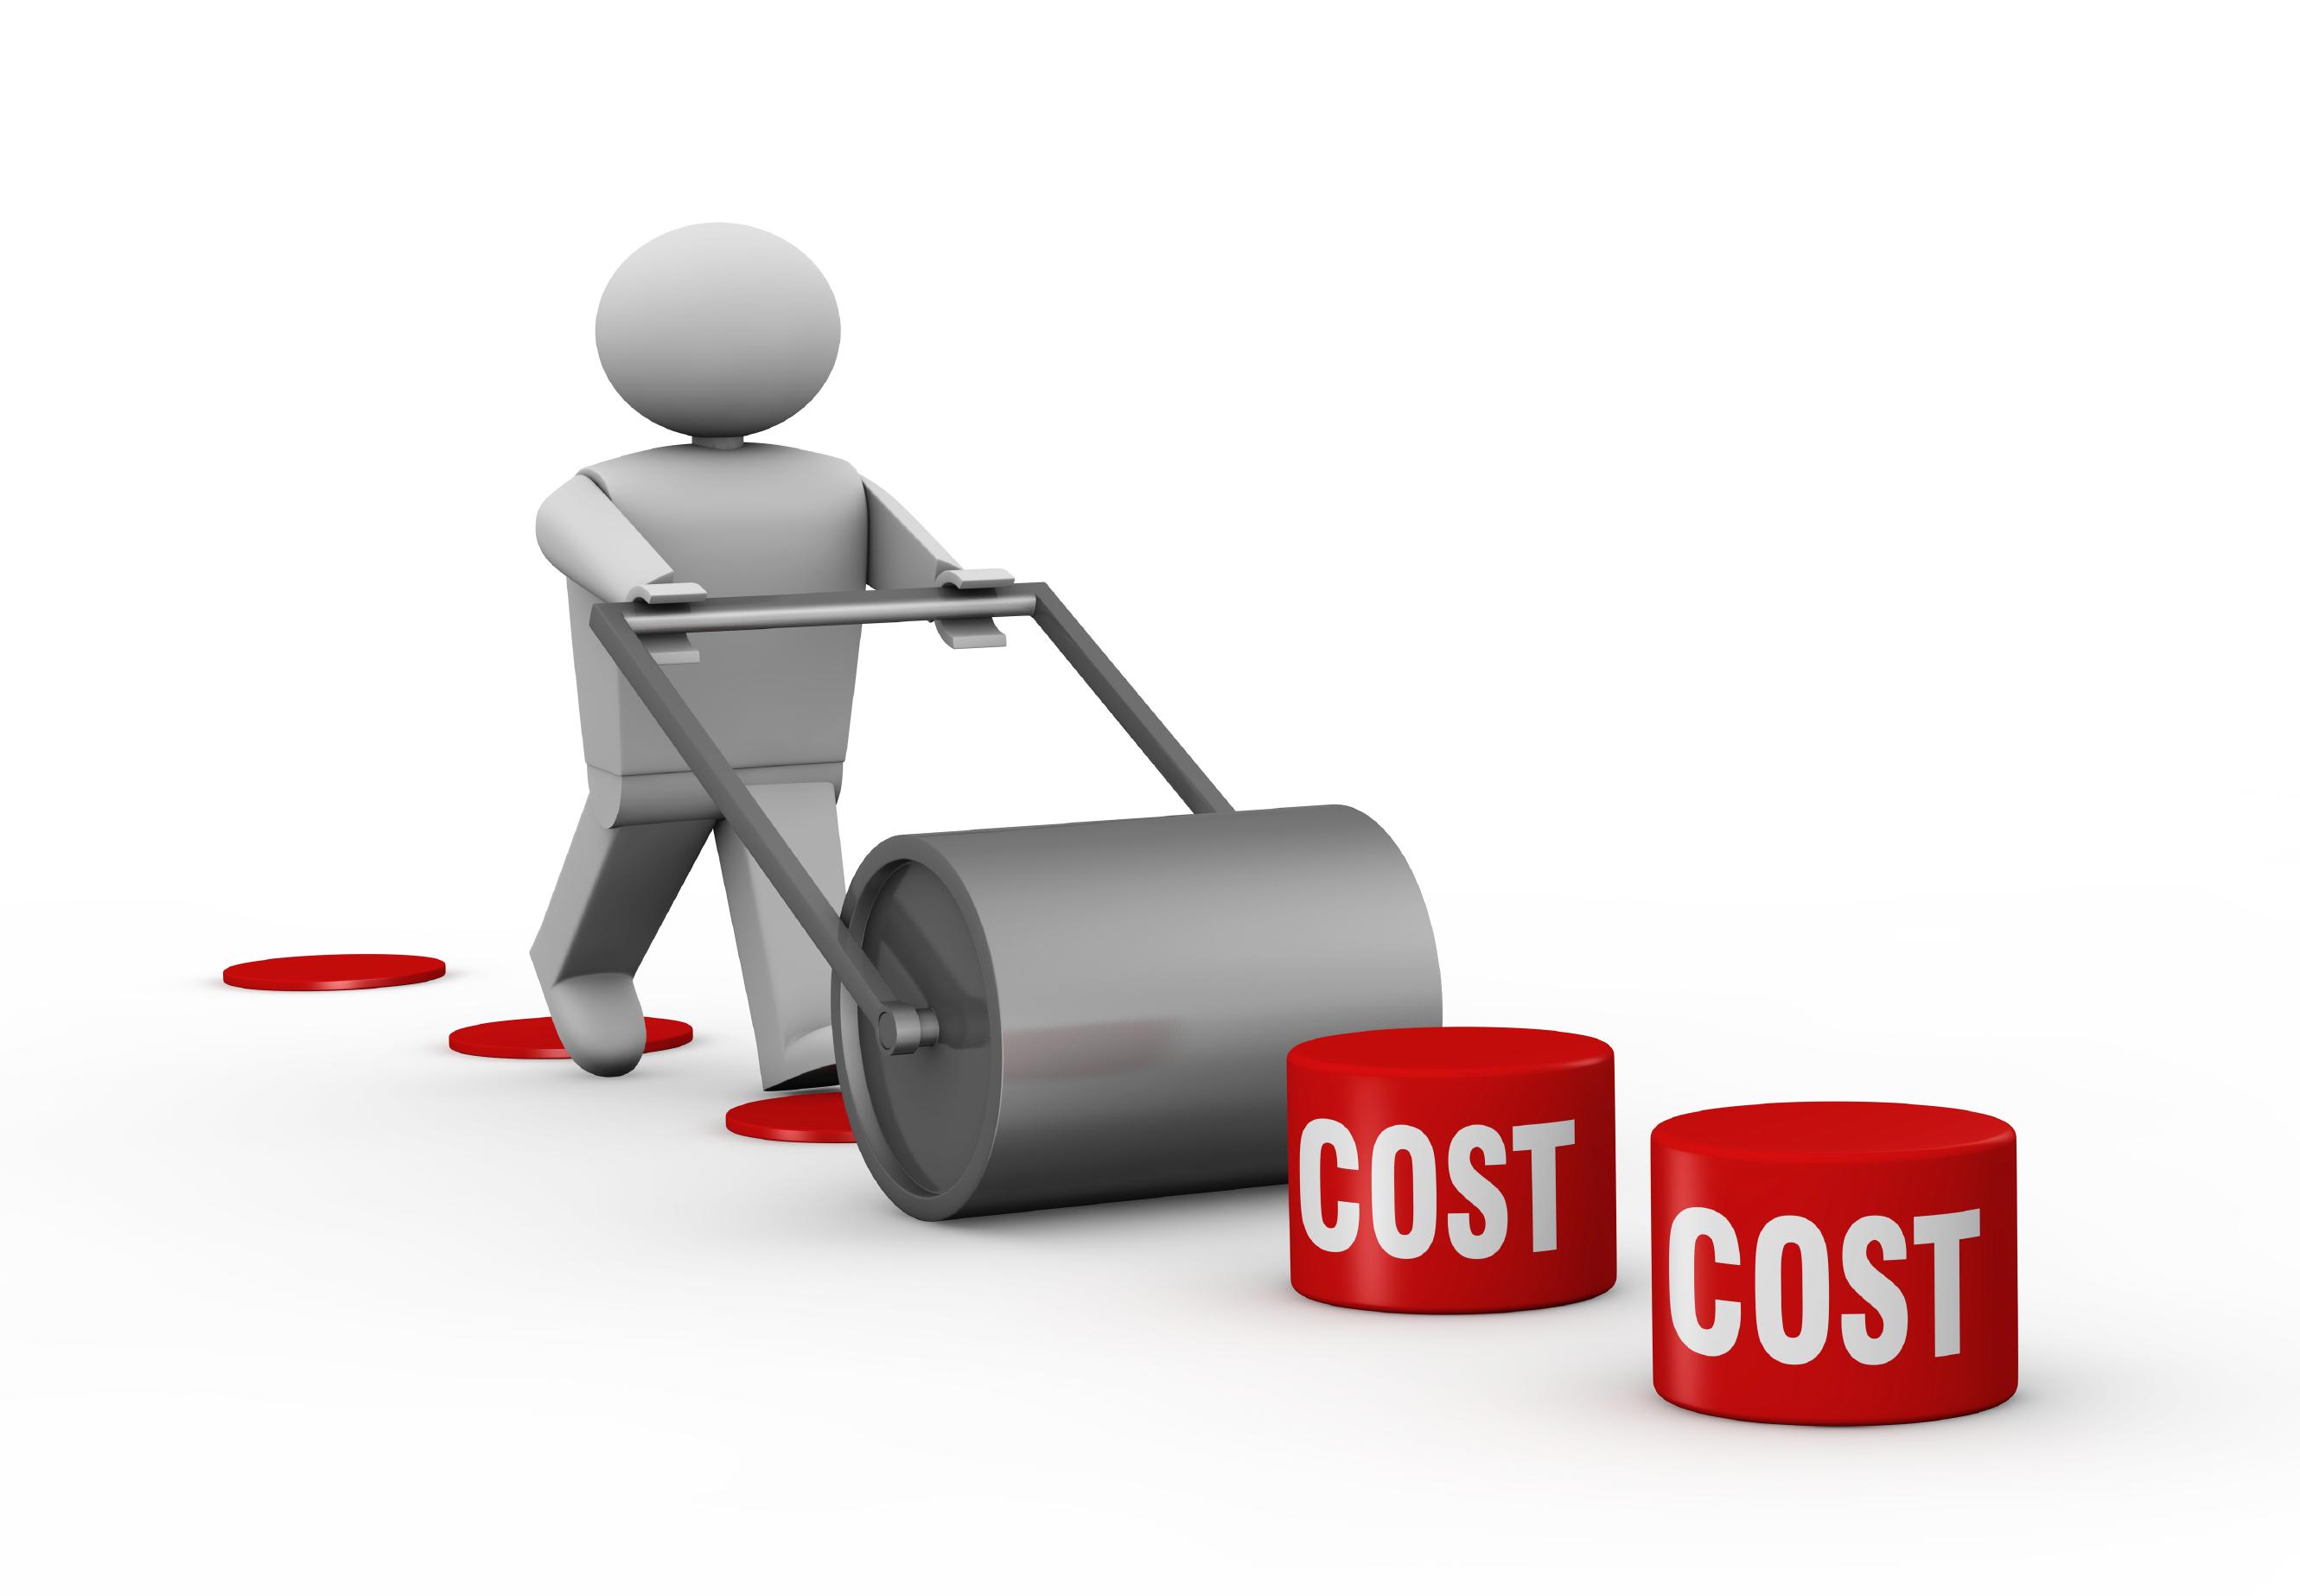 Telecom Expense Management Cost Savings